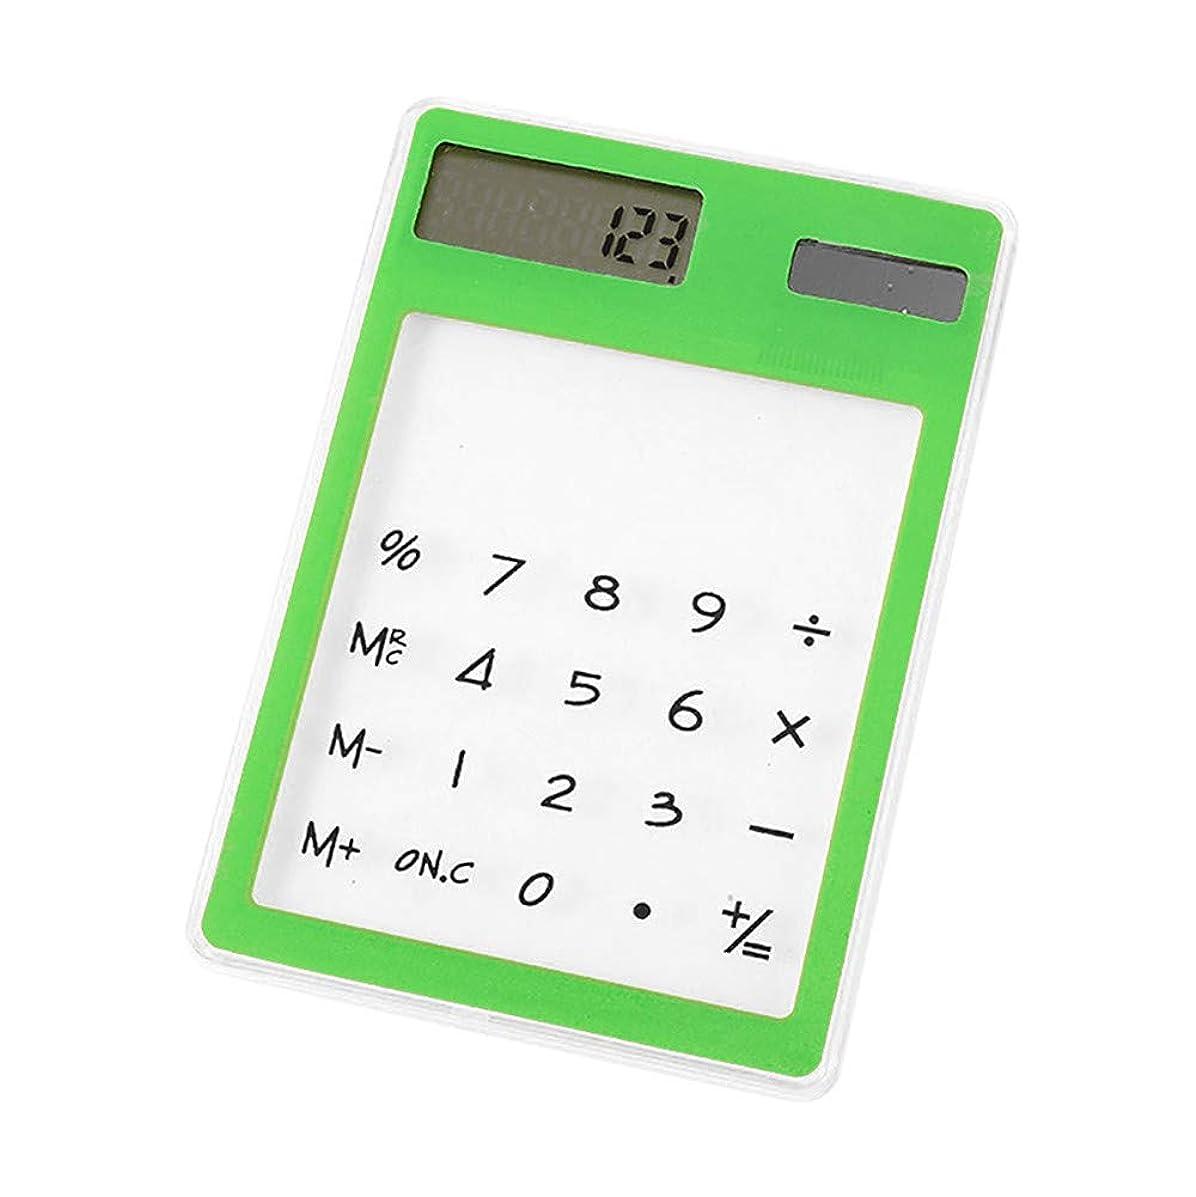 Sikye Mini Calculator,PVC Slim Solar Energy LED Transparent Scientific Calculator,Random Color